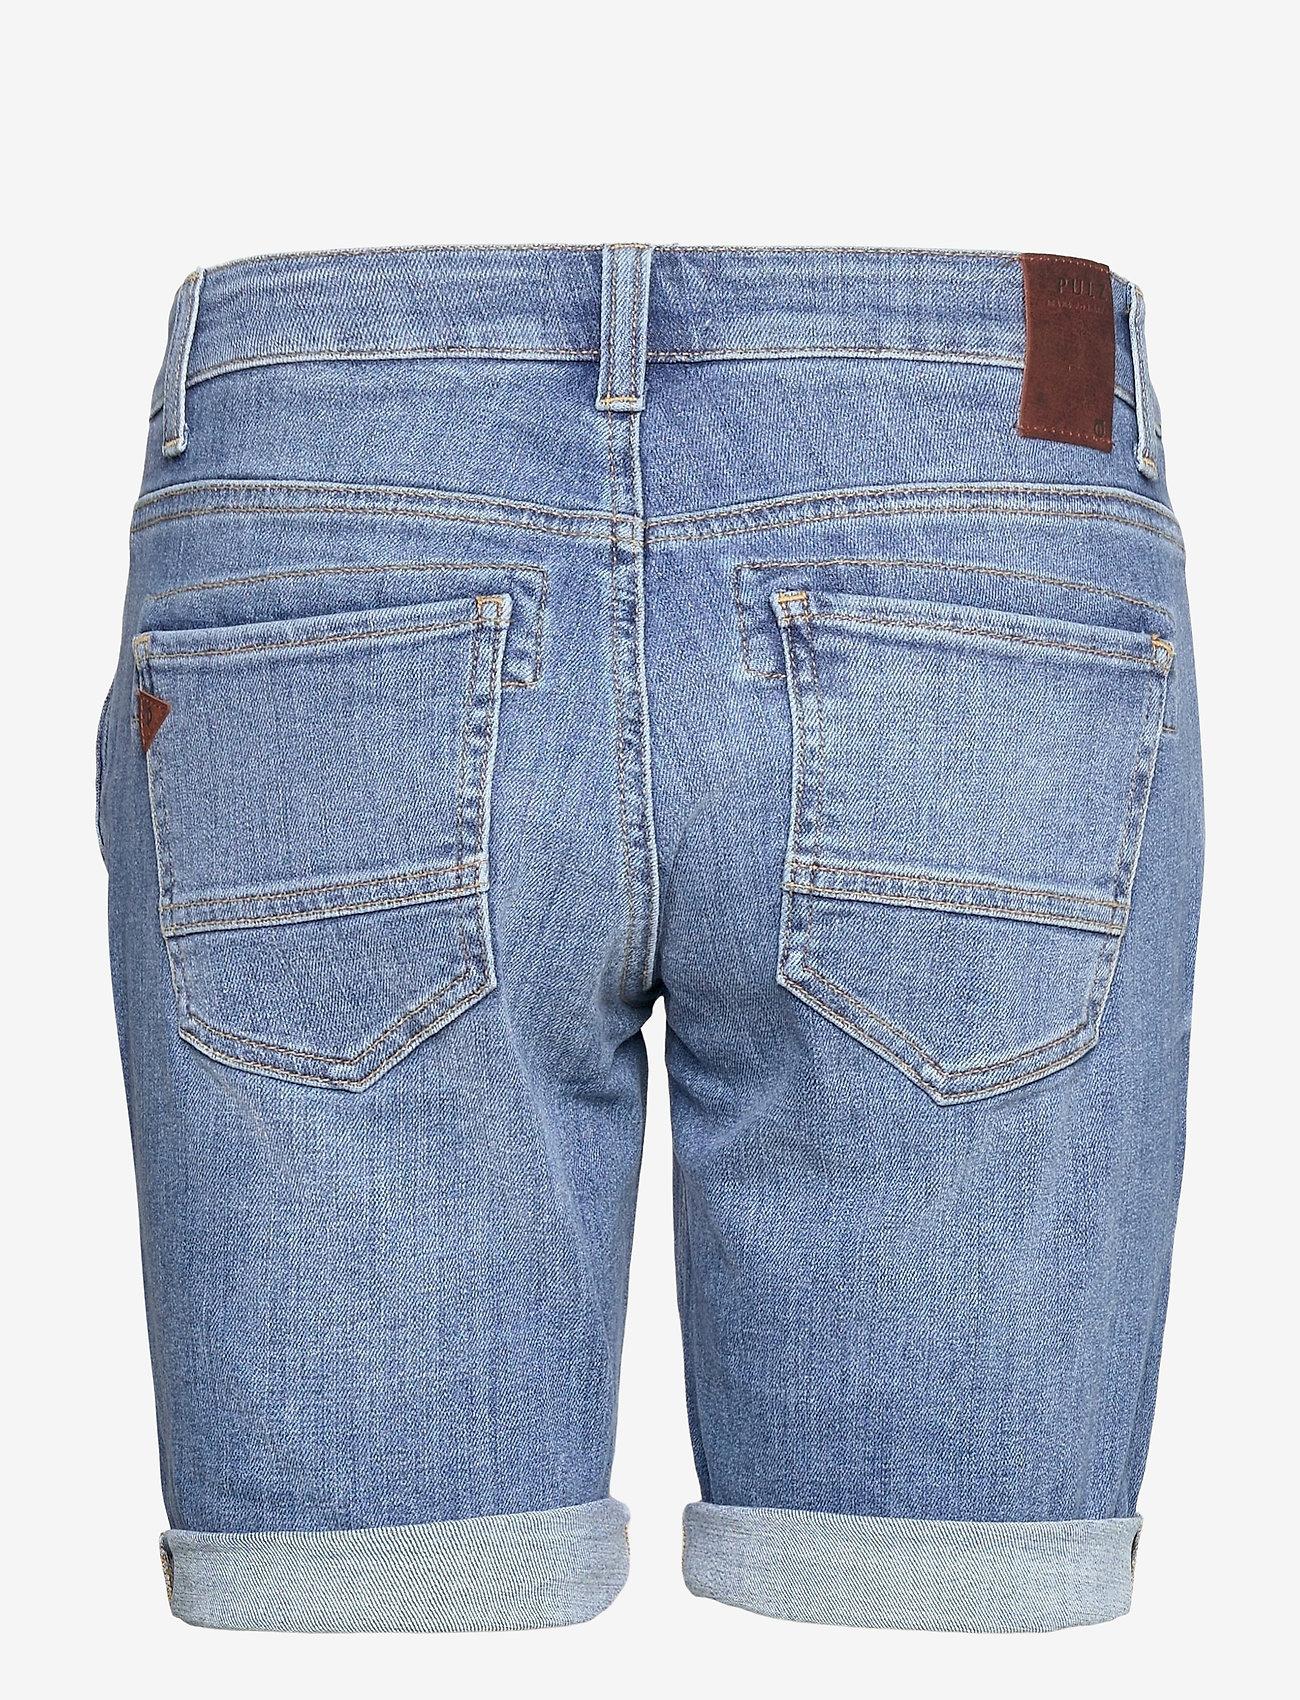 Pulz Jeans - PZMARY Shorts - denimshorts - light blue denim - 1